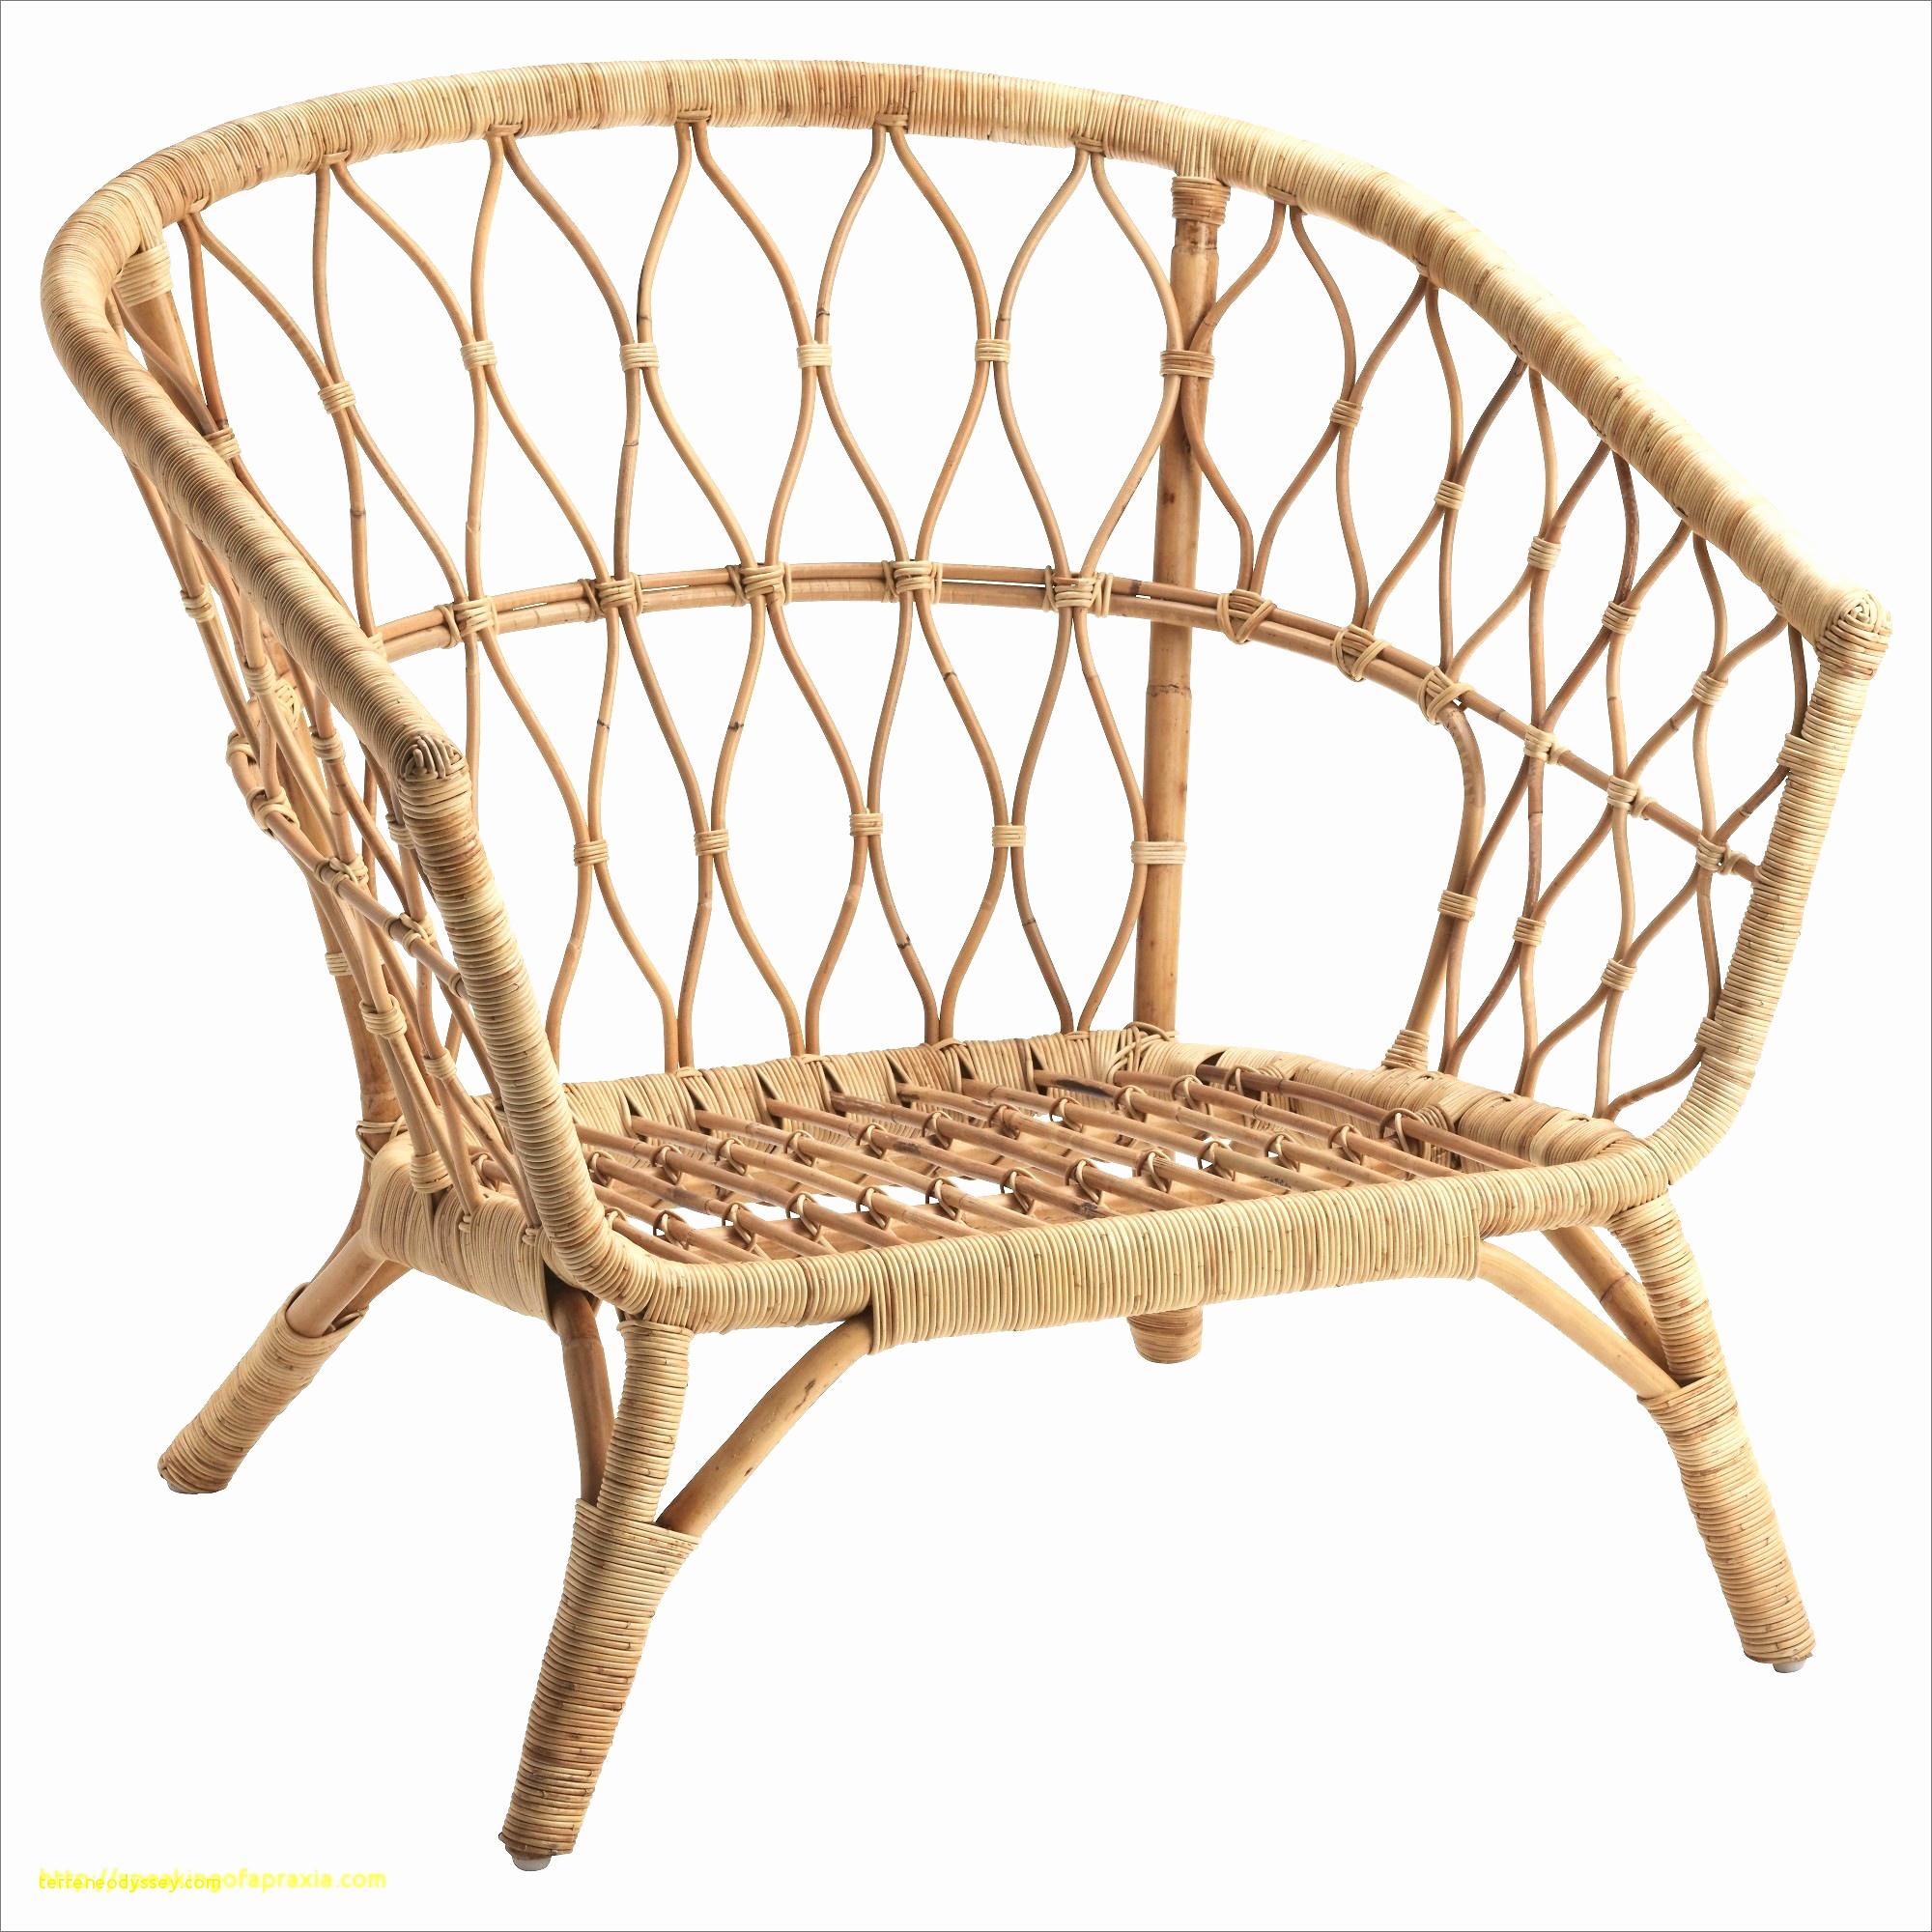 chaise fabrication francaise unique chaise rotin ikea ikea cuisine meuble haut frais alinea chaise 0d of chaise fabrication francaise